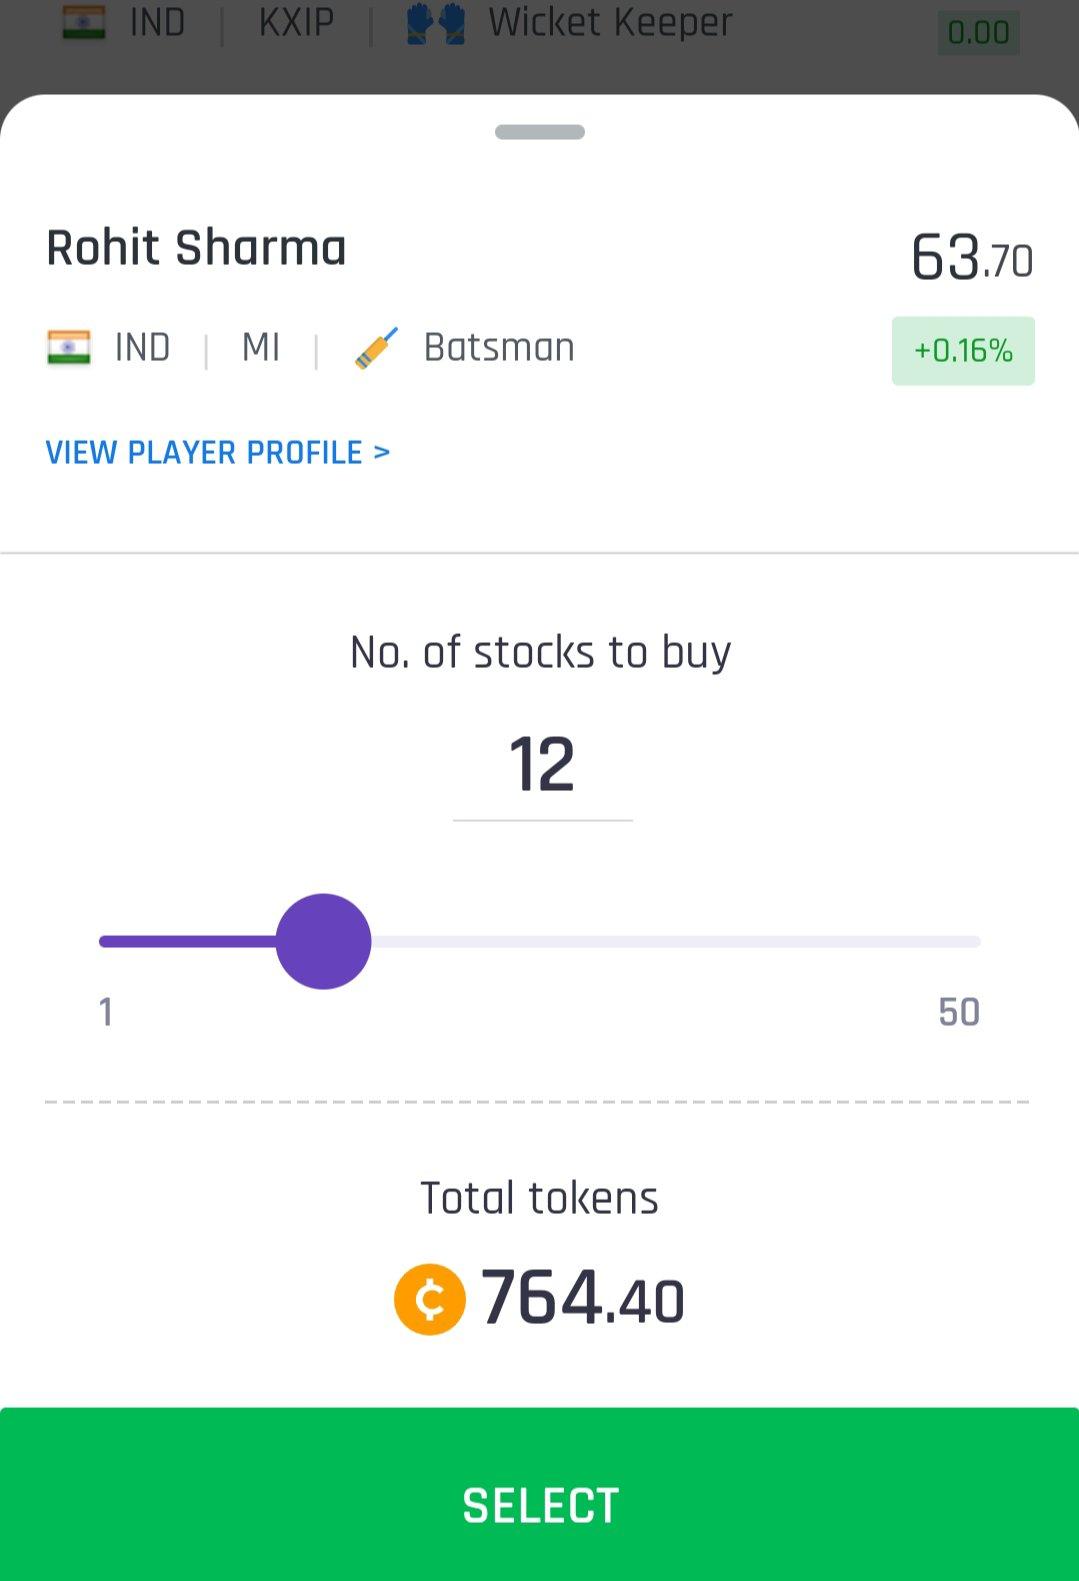 SixerGame Fantasy - Refer & Earn Upto ₹100 | IPL Loot 11